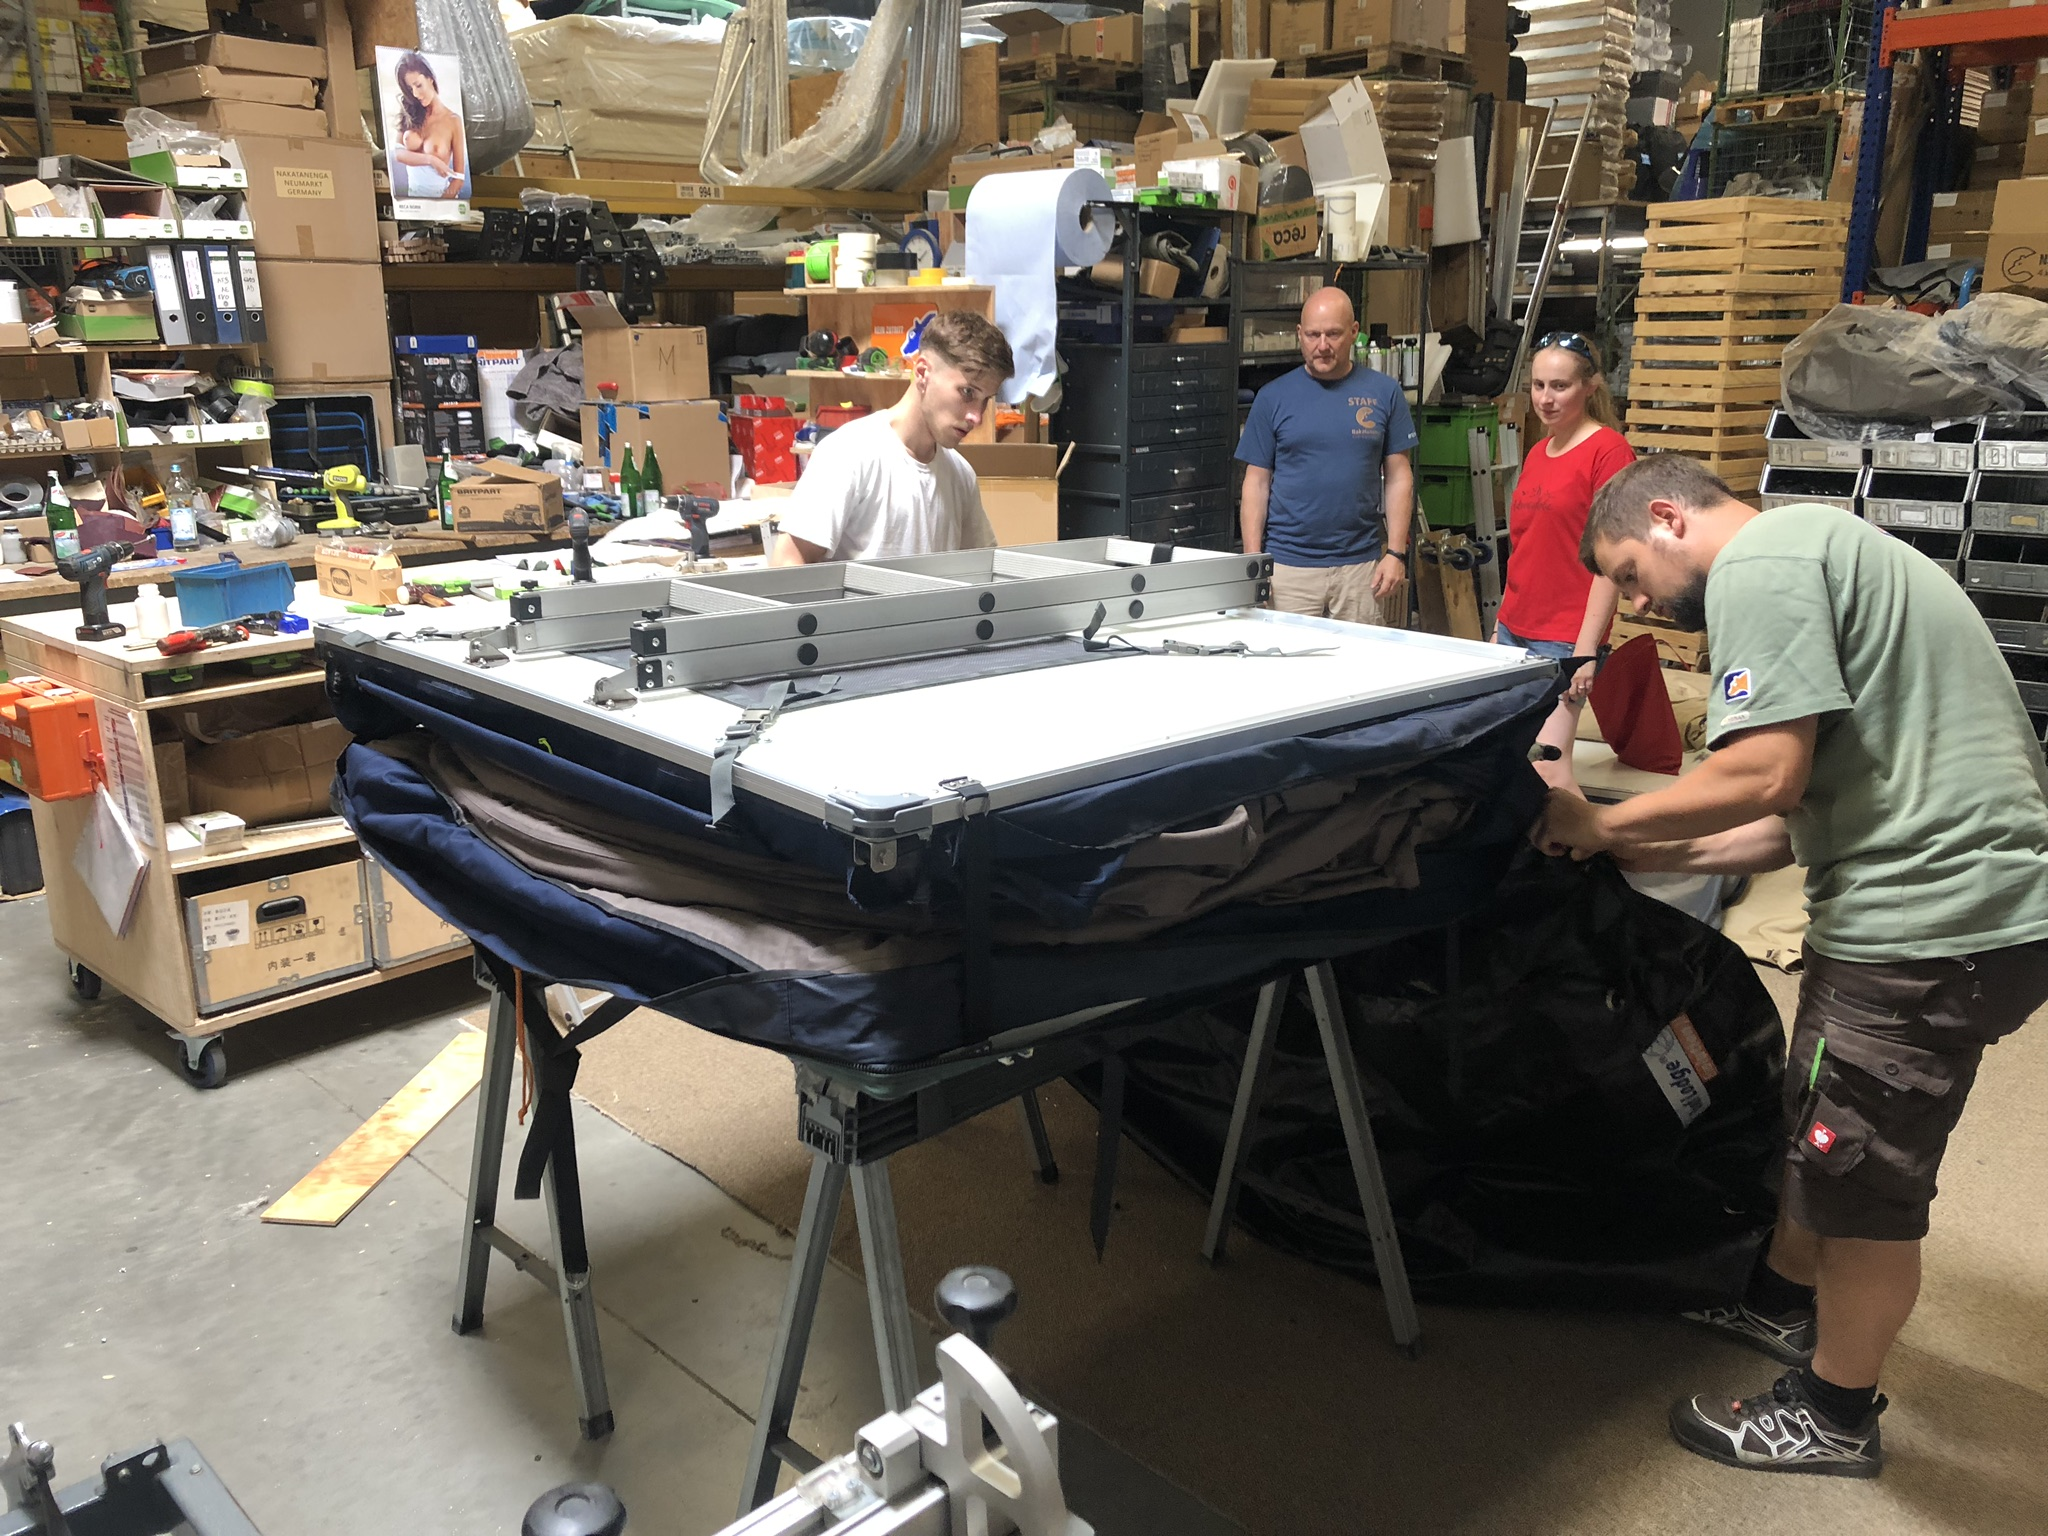 Dachzelt-Test - Zusammenbau des Roof Lodge Evolution II Extended